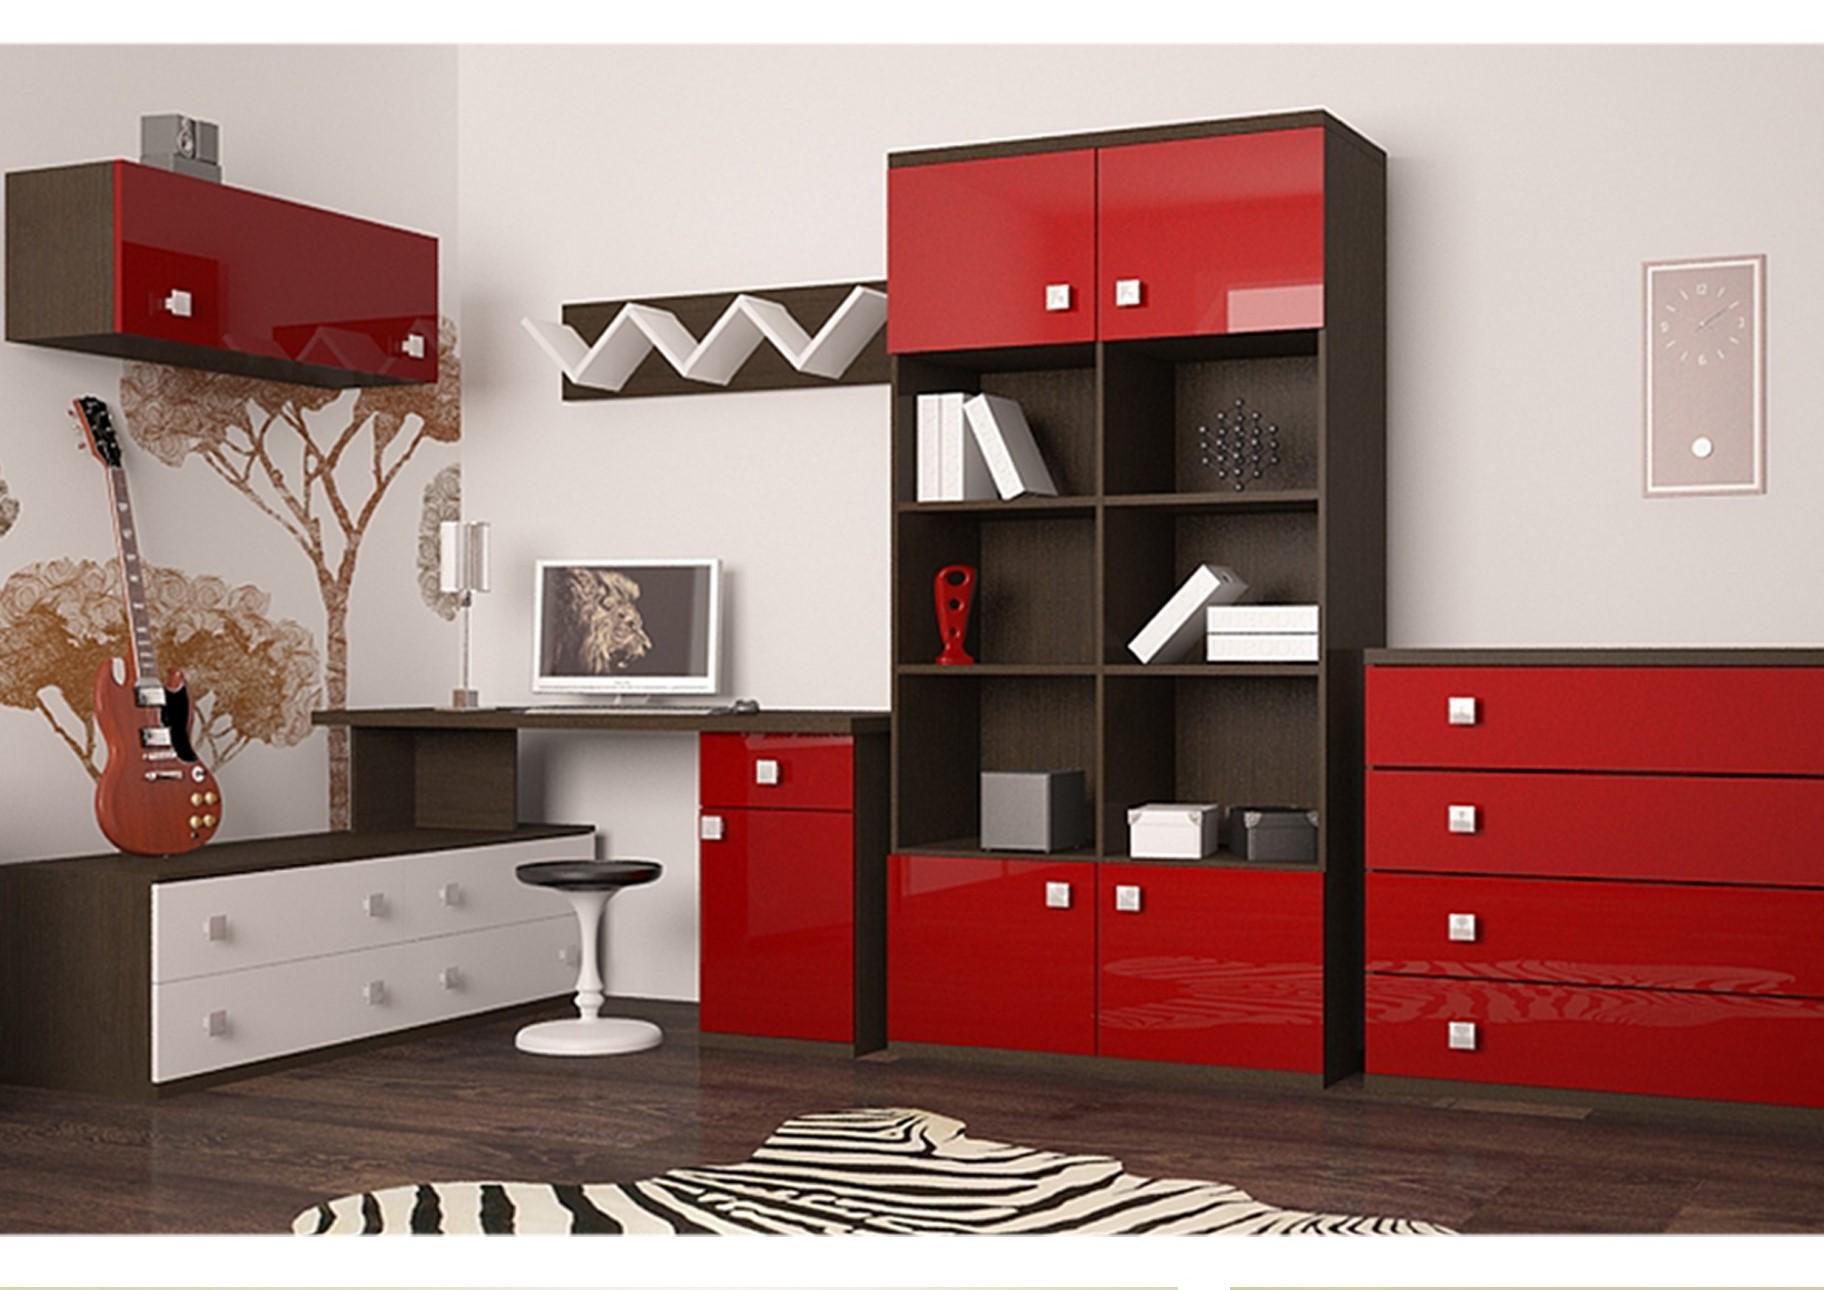 Глянцевые красные фасады мебели